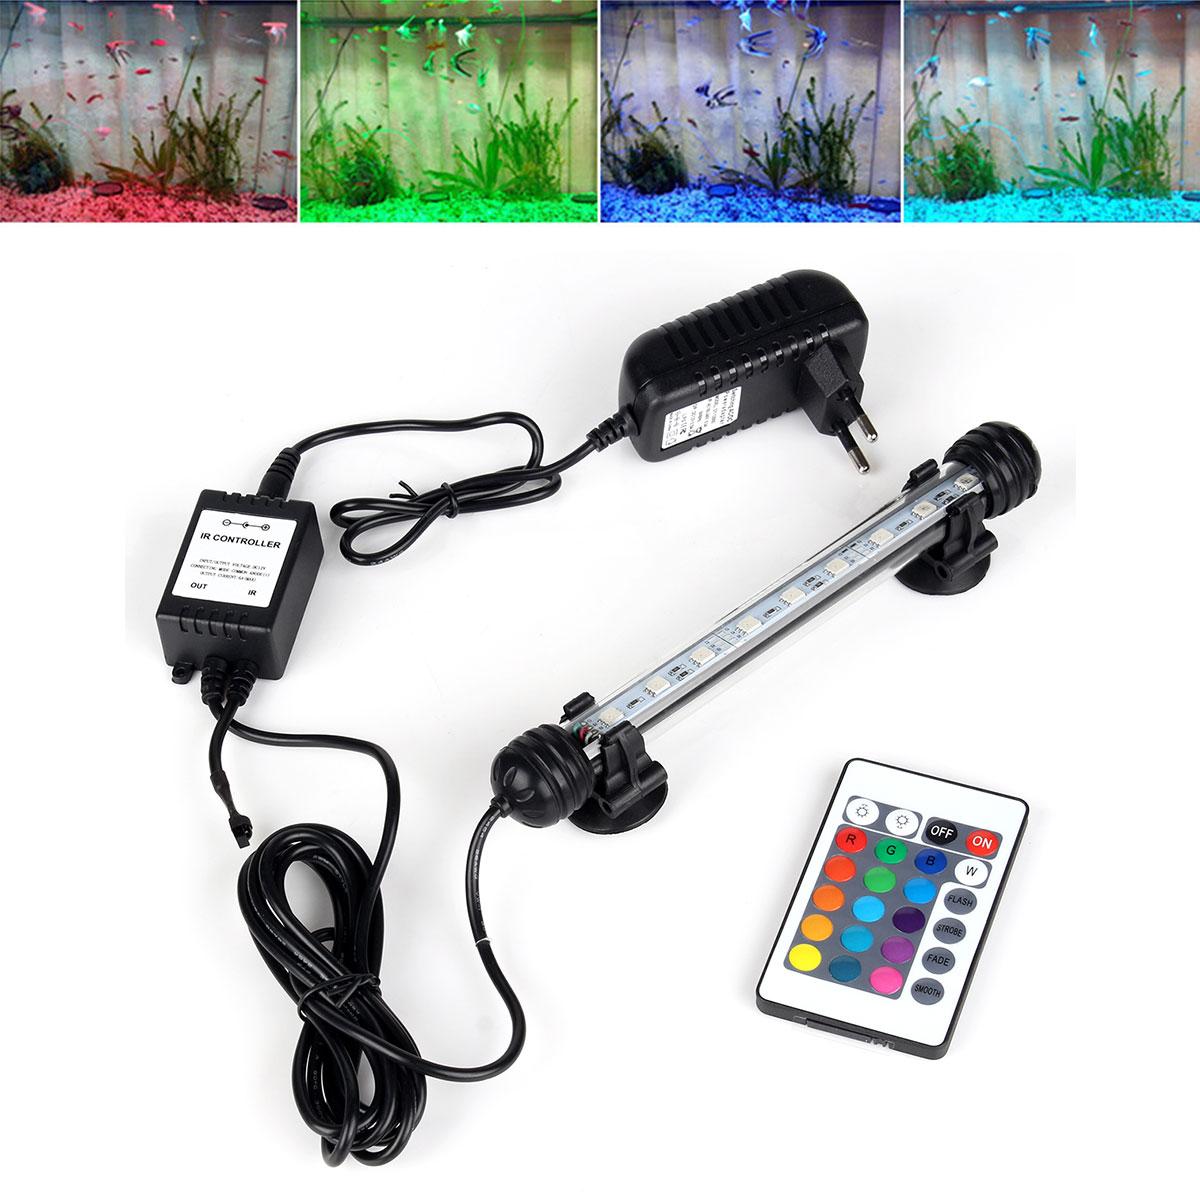 EU Plug Aquarium Fish Tank LED Light RGB Remote Waterproof 5050 SMD LED Bar Light Lamp Submersible